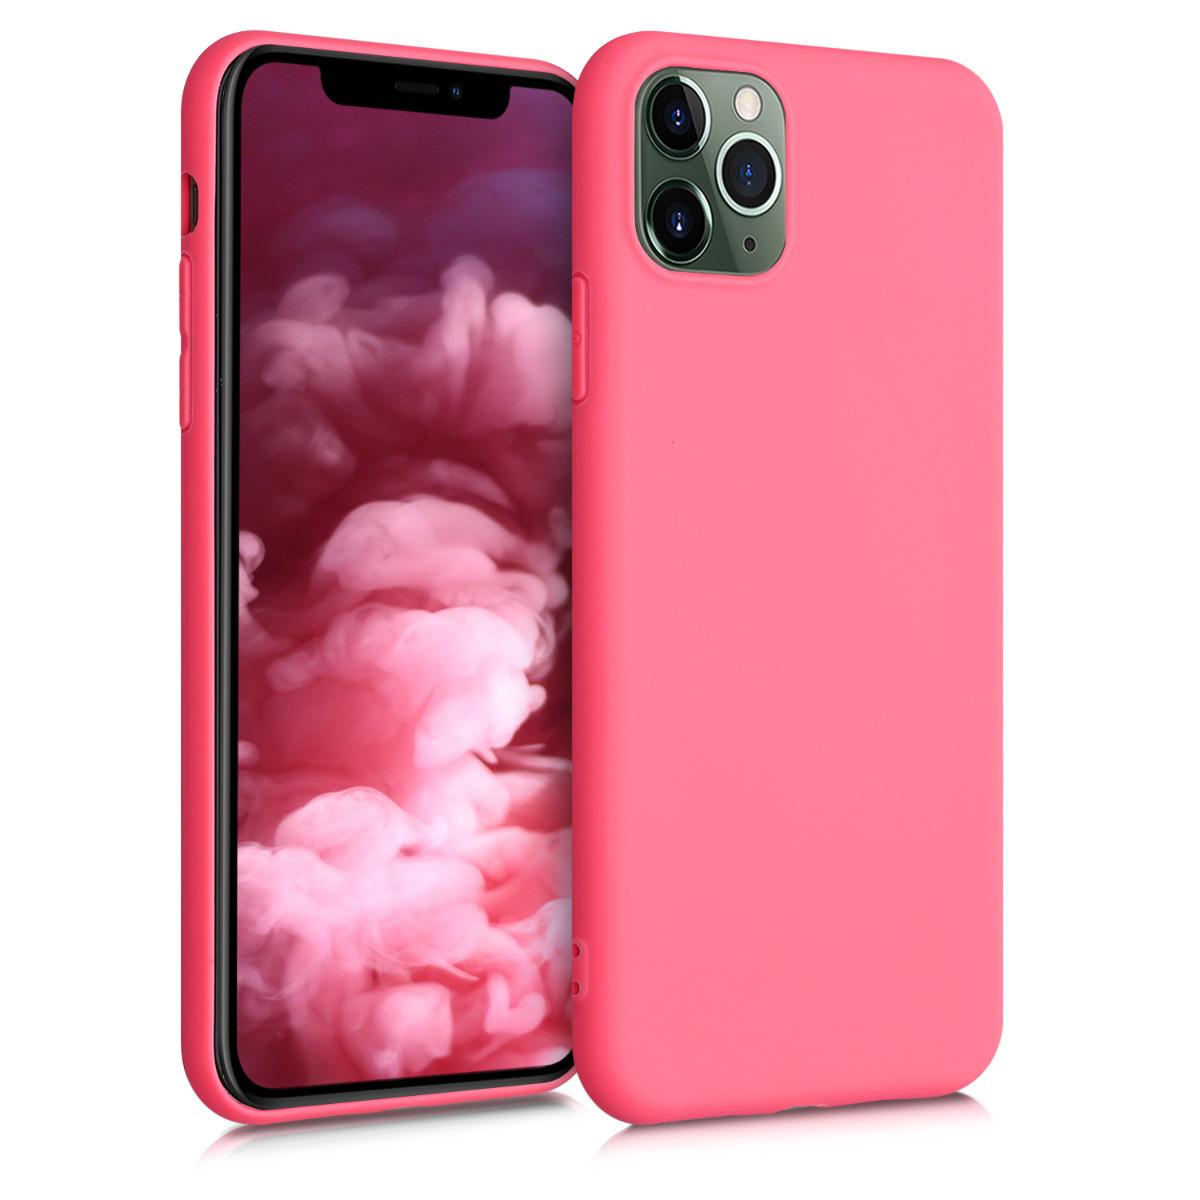 Kvalitní silikonové TPU pouzdro pro Apple iPhone 11 Pro Max - Neon Coral Matte